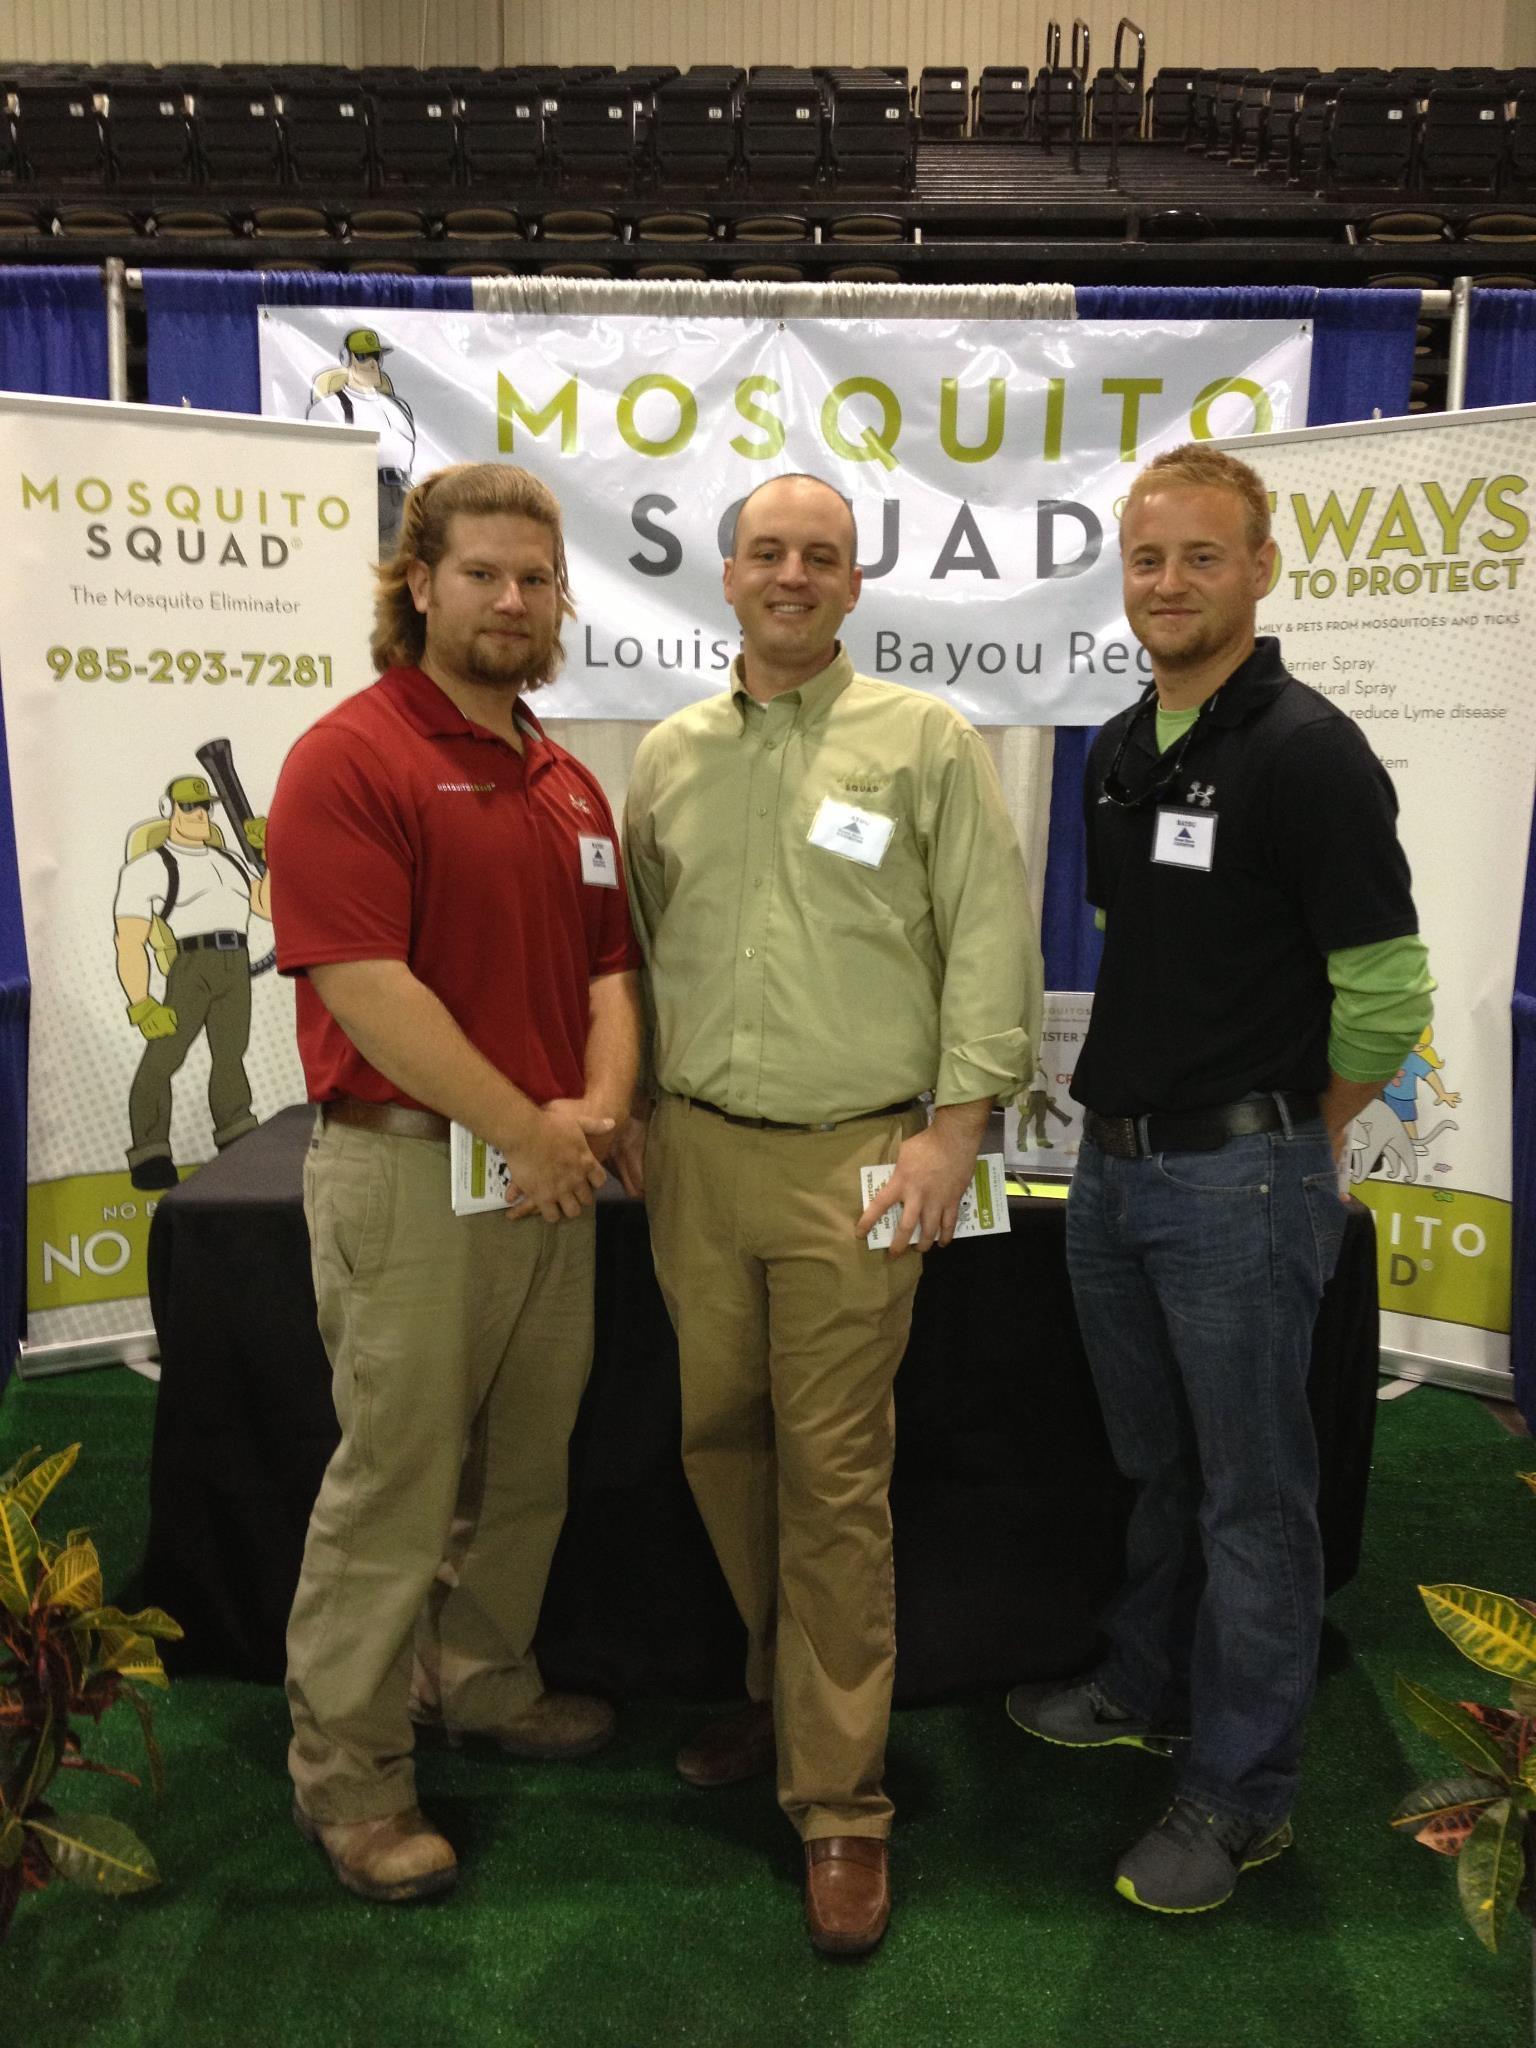 Mosquito Squad of Louisiana Bayou Region